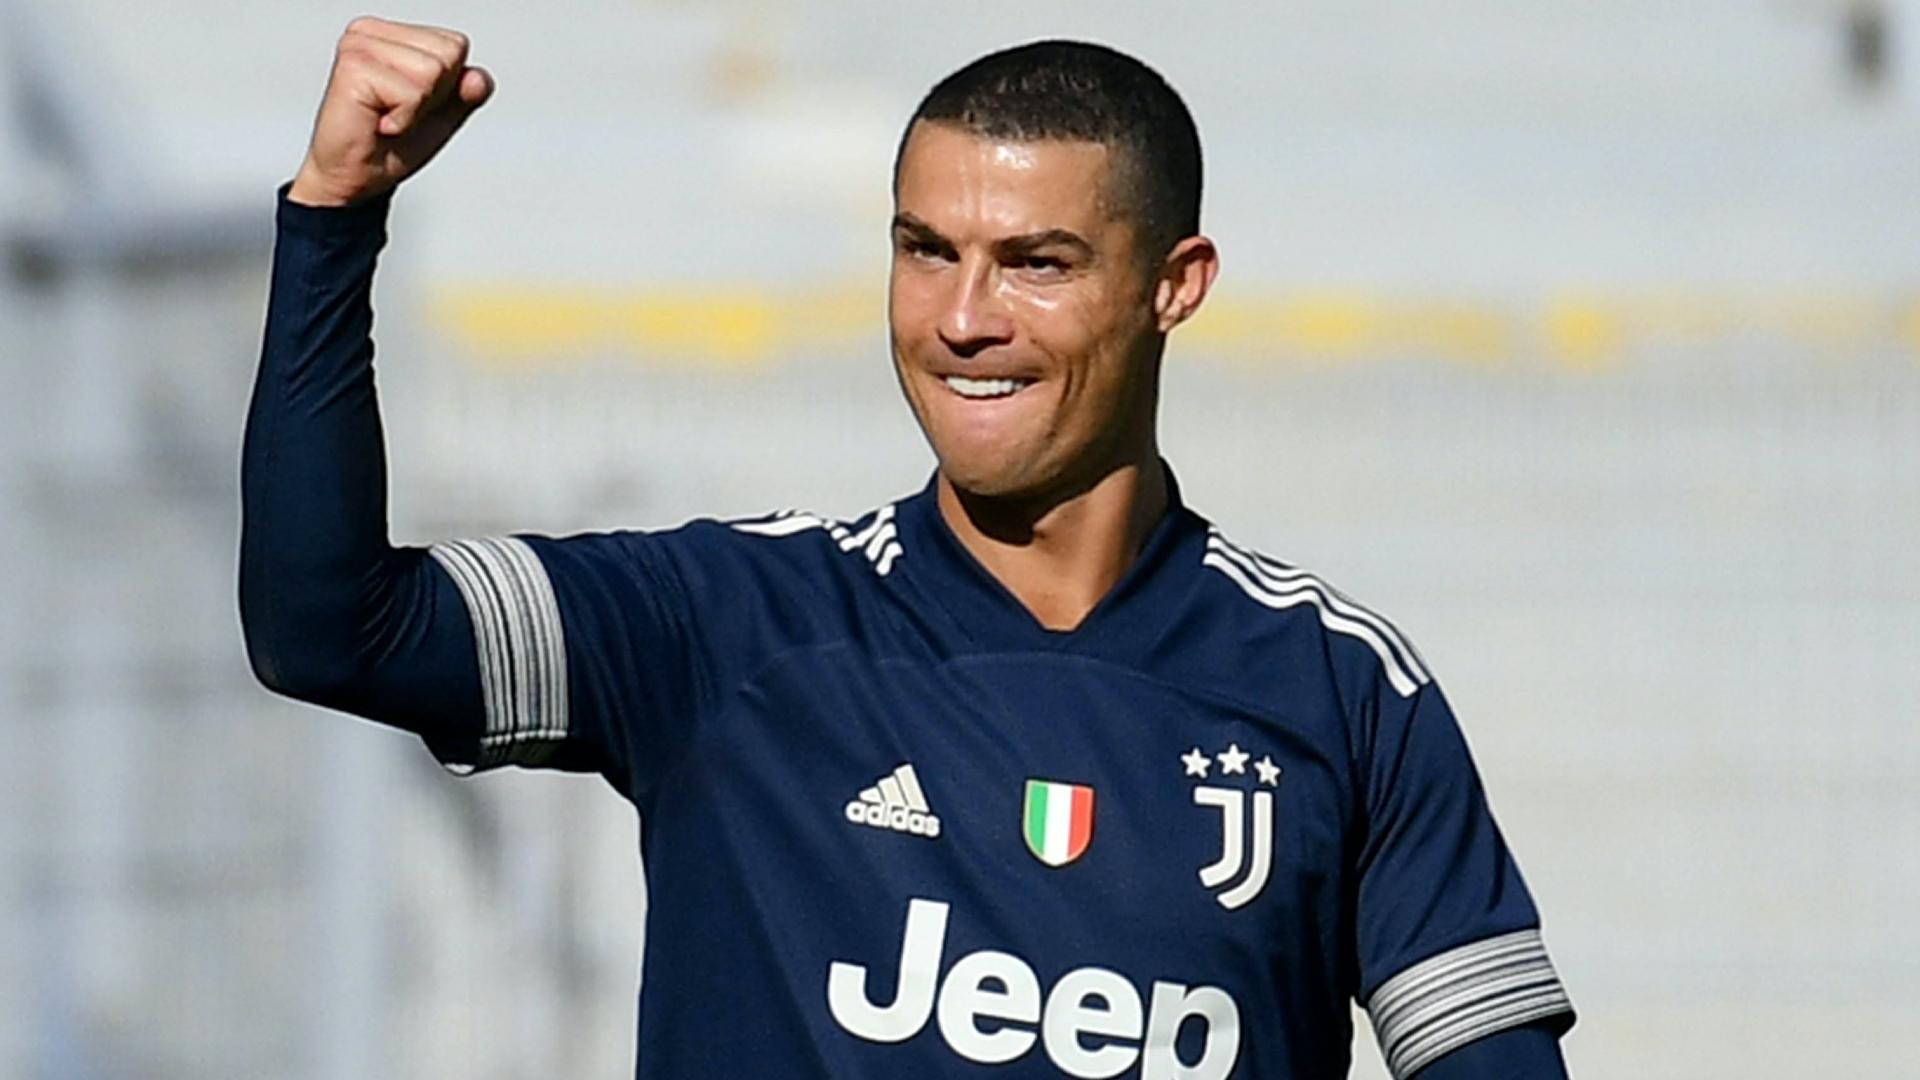 Ronaldo's future at Juventus confirmed despite Real Madrid return rumours